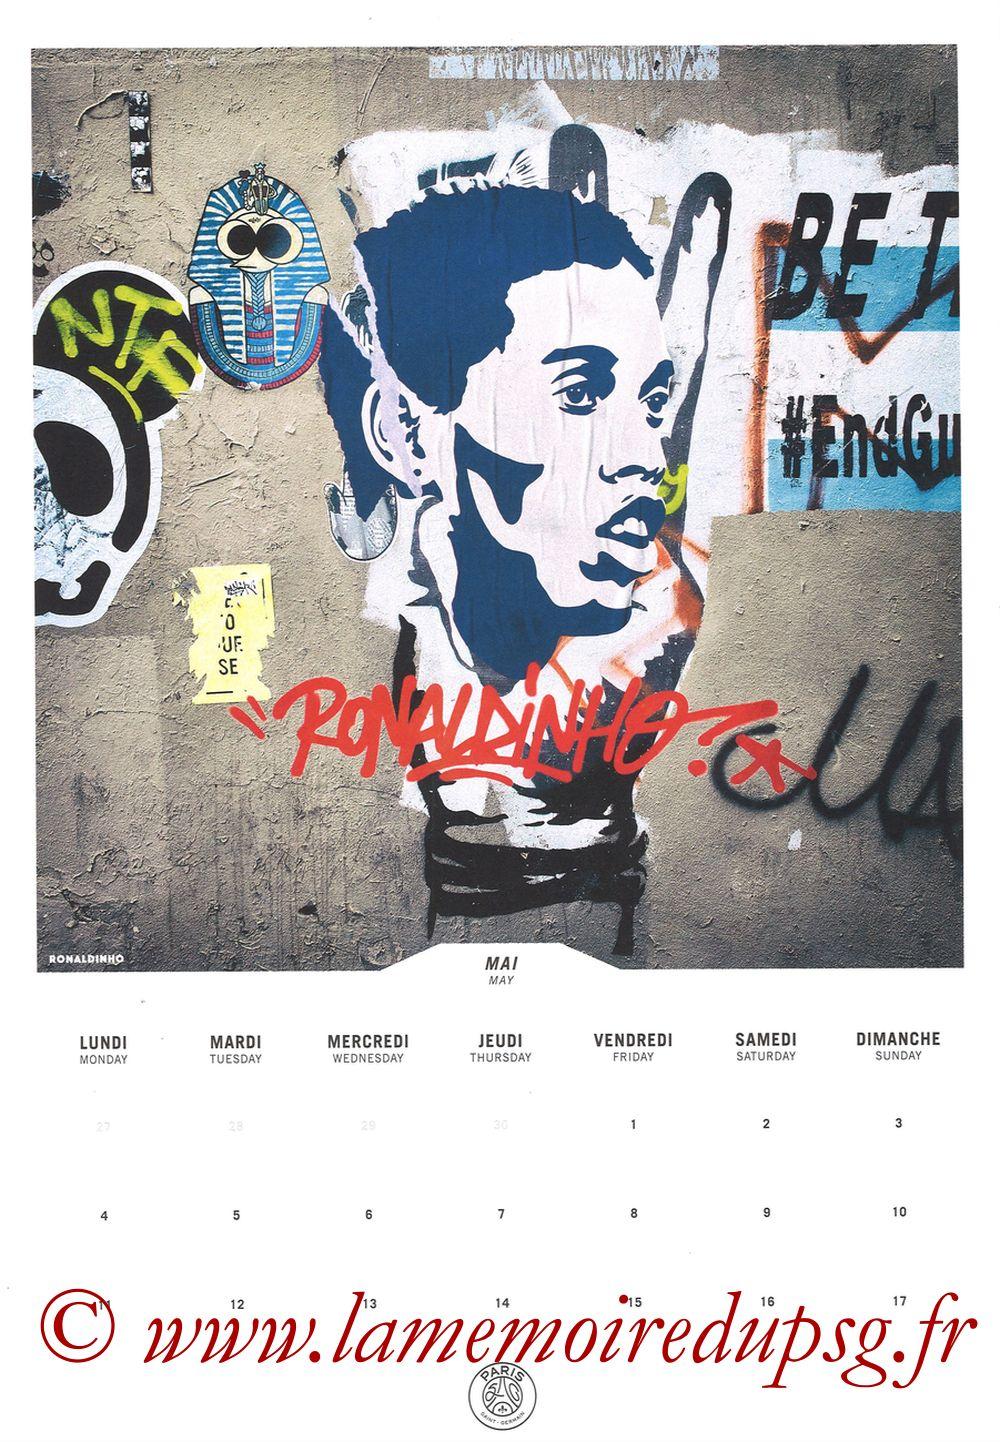 Calendrier PSG 2020 - Page 09 - RONALDHINO